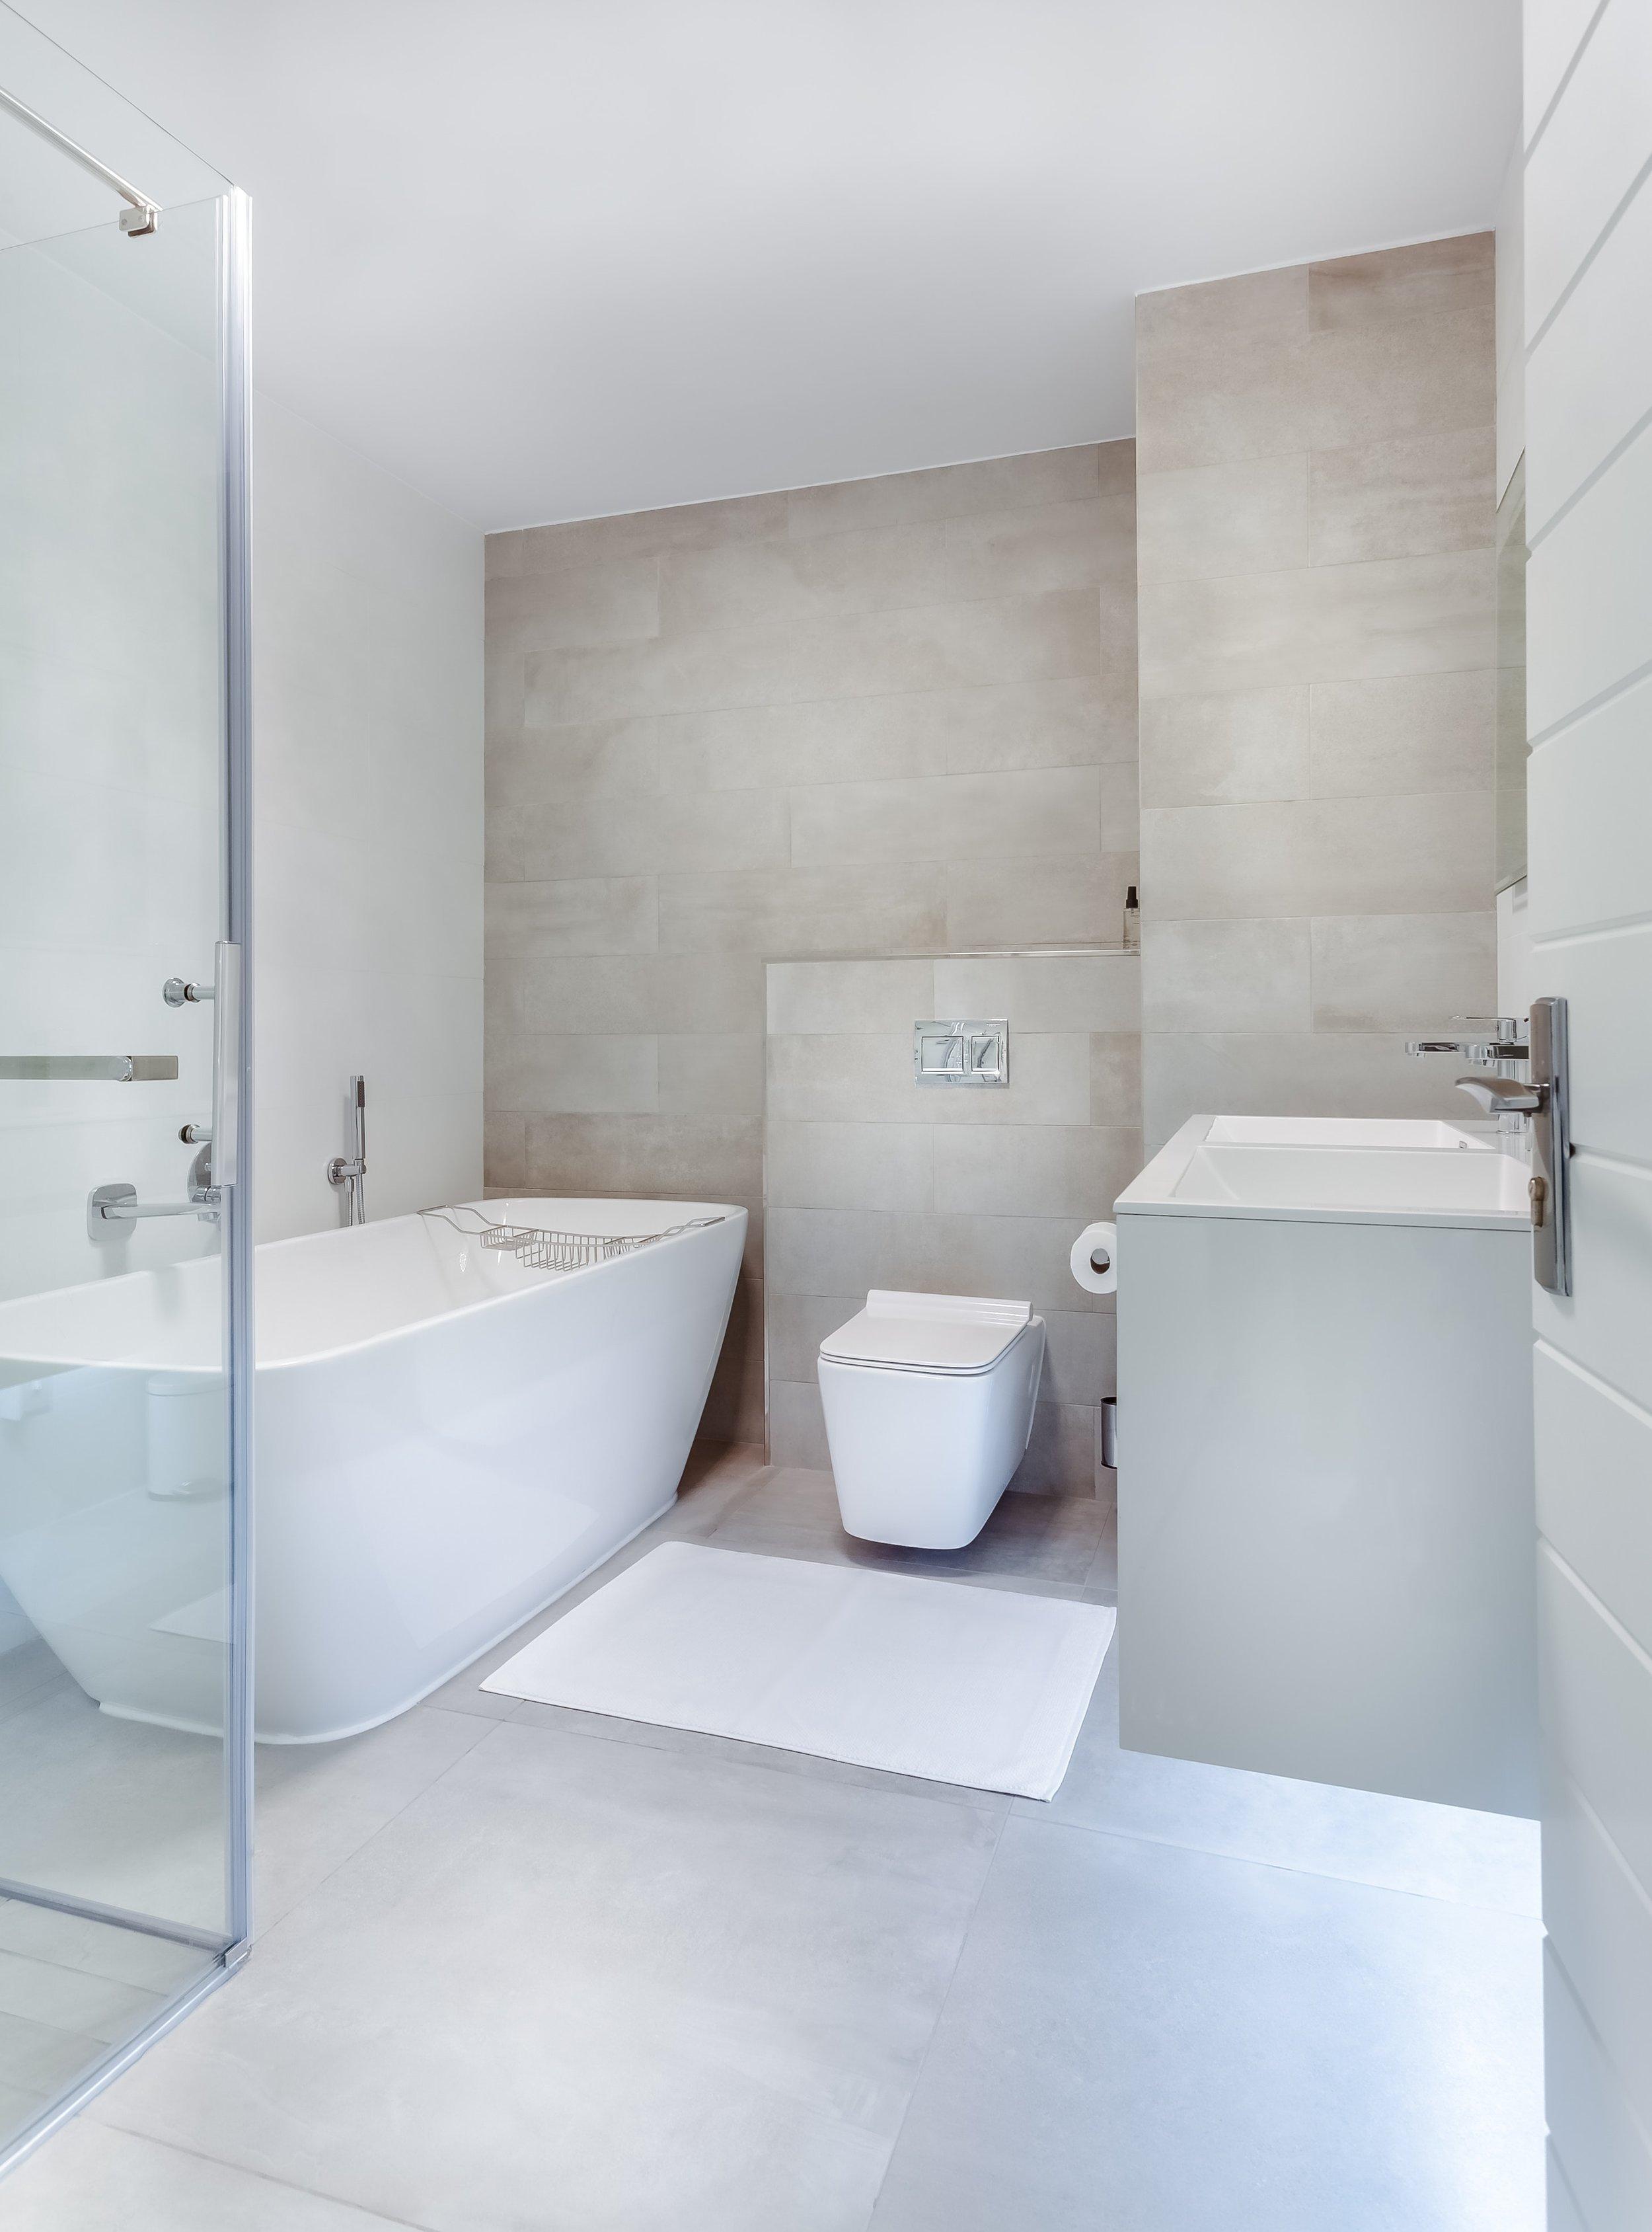 Radiant Floor Heating In Bathrooms, Heated Bathroom Floor Cost